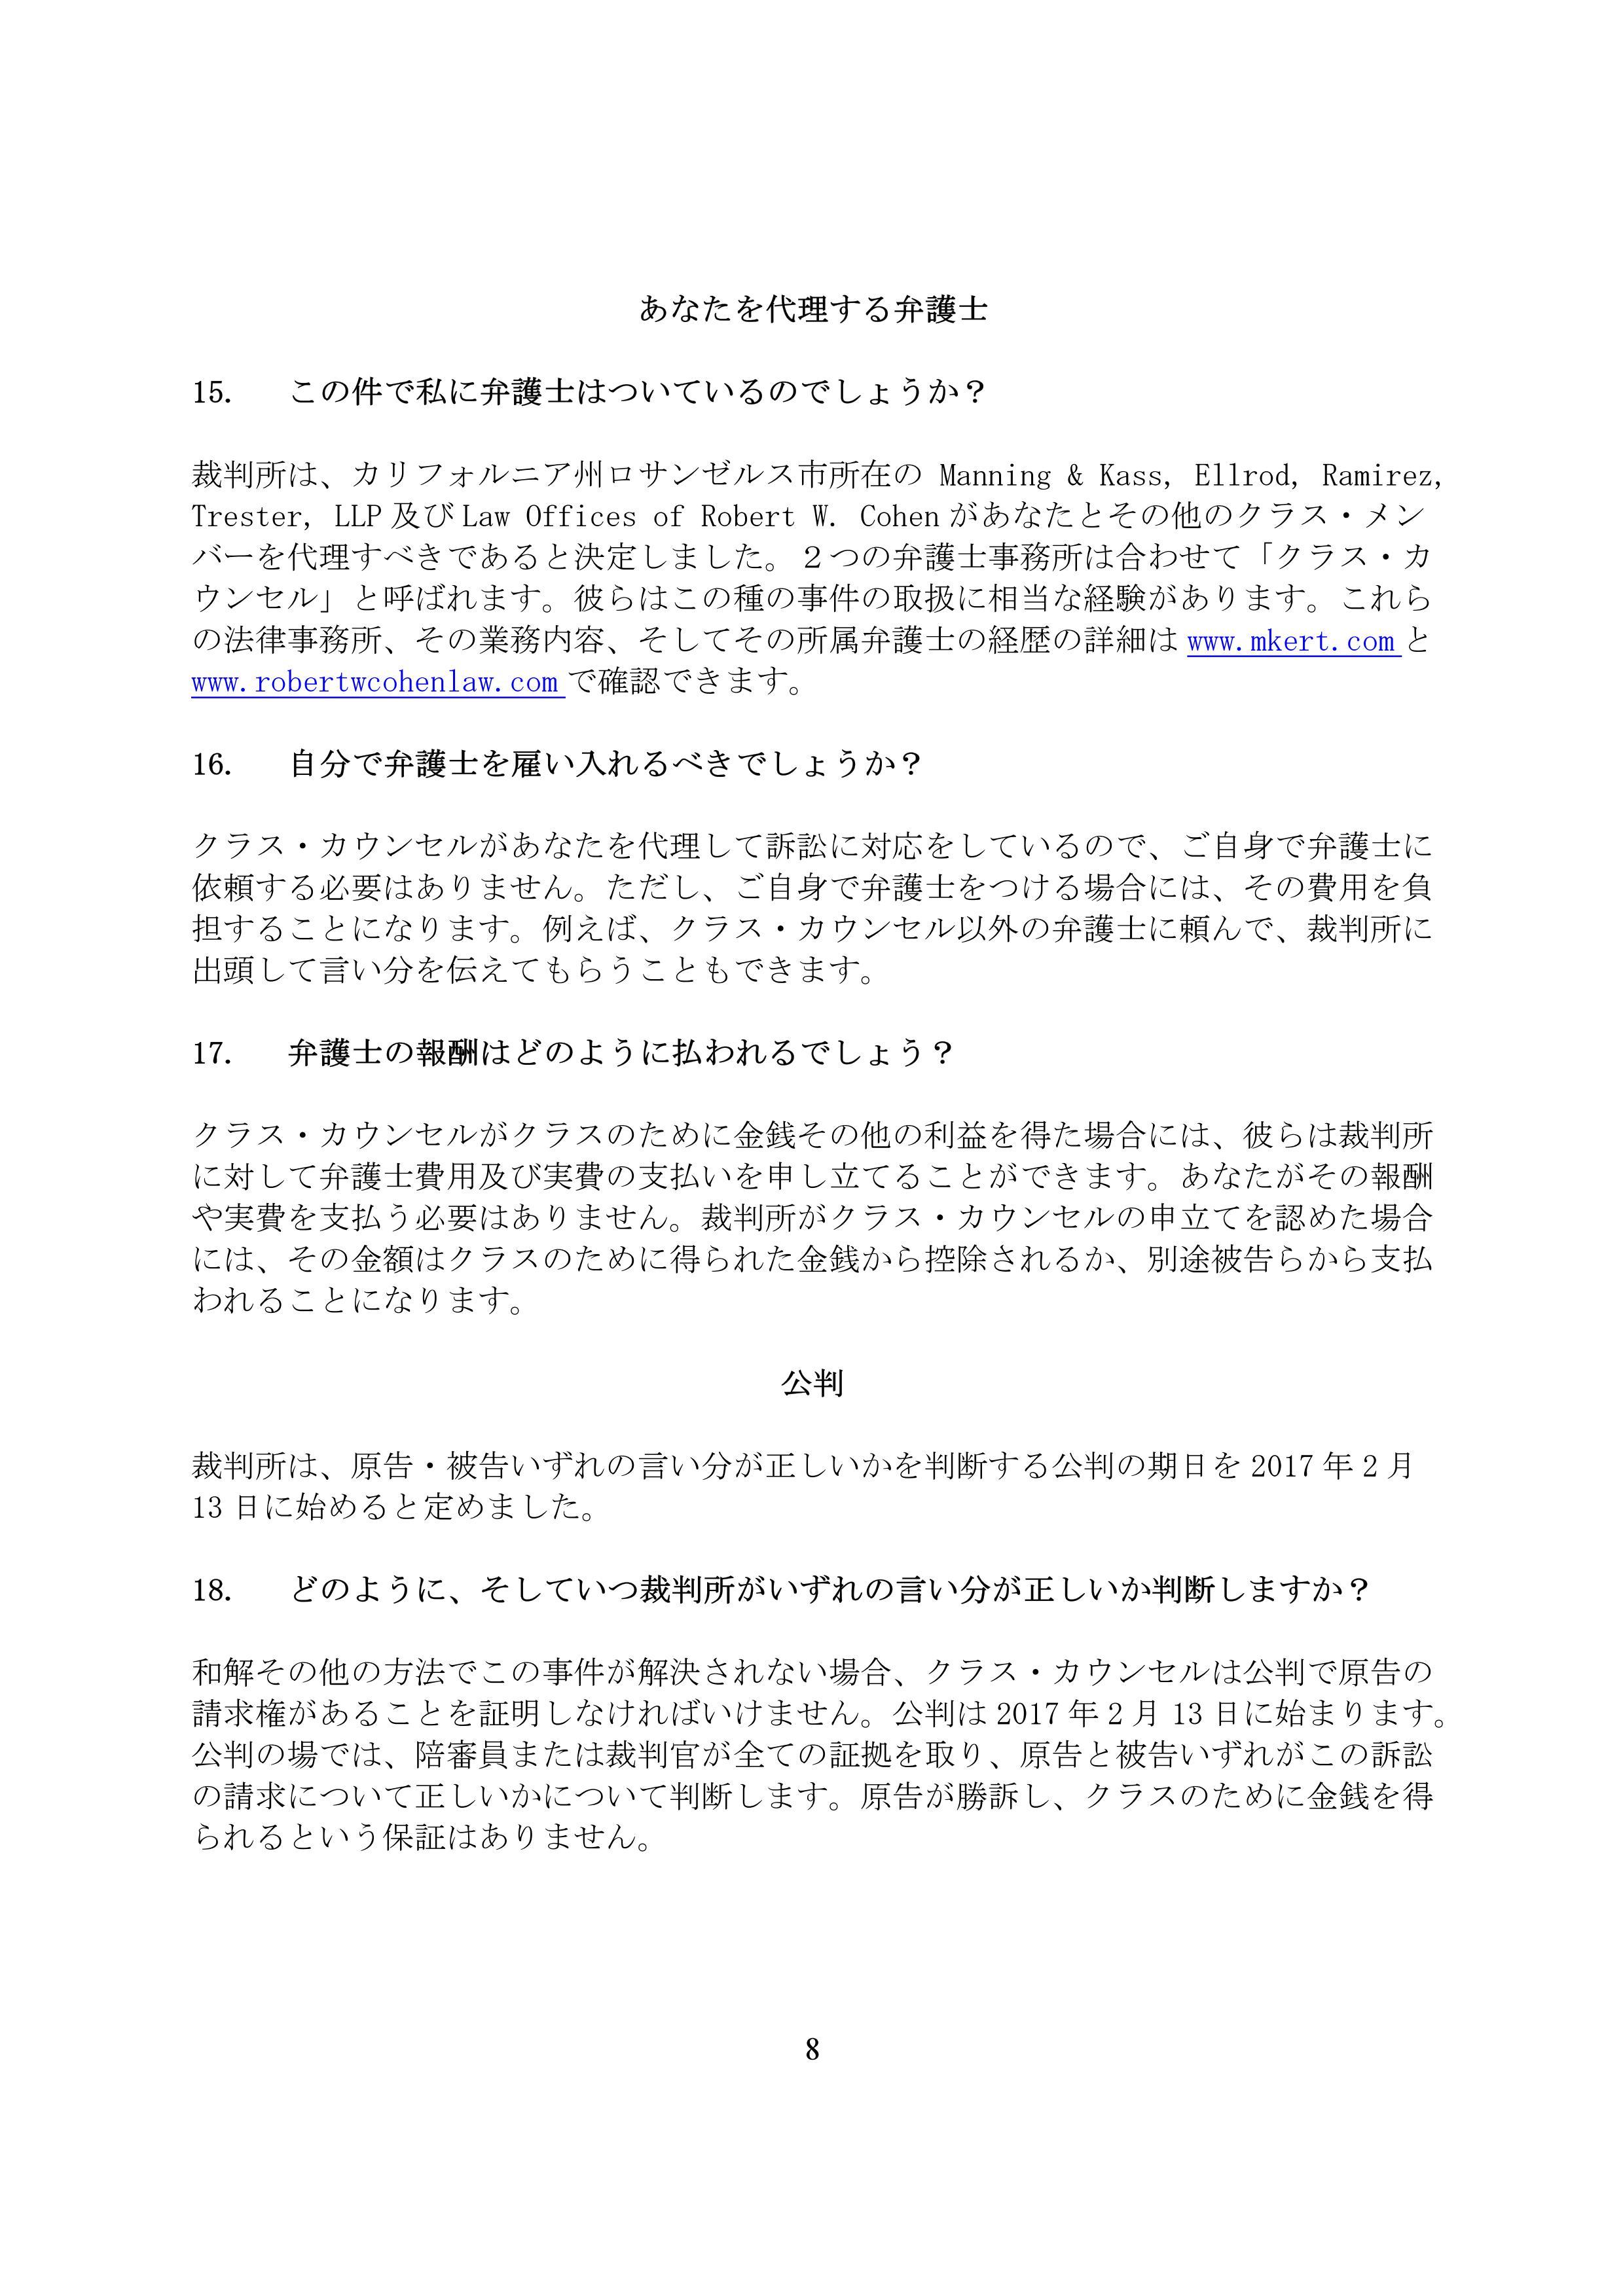 MRI Class Cert Notice_Japanese translation_08